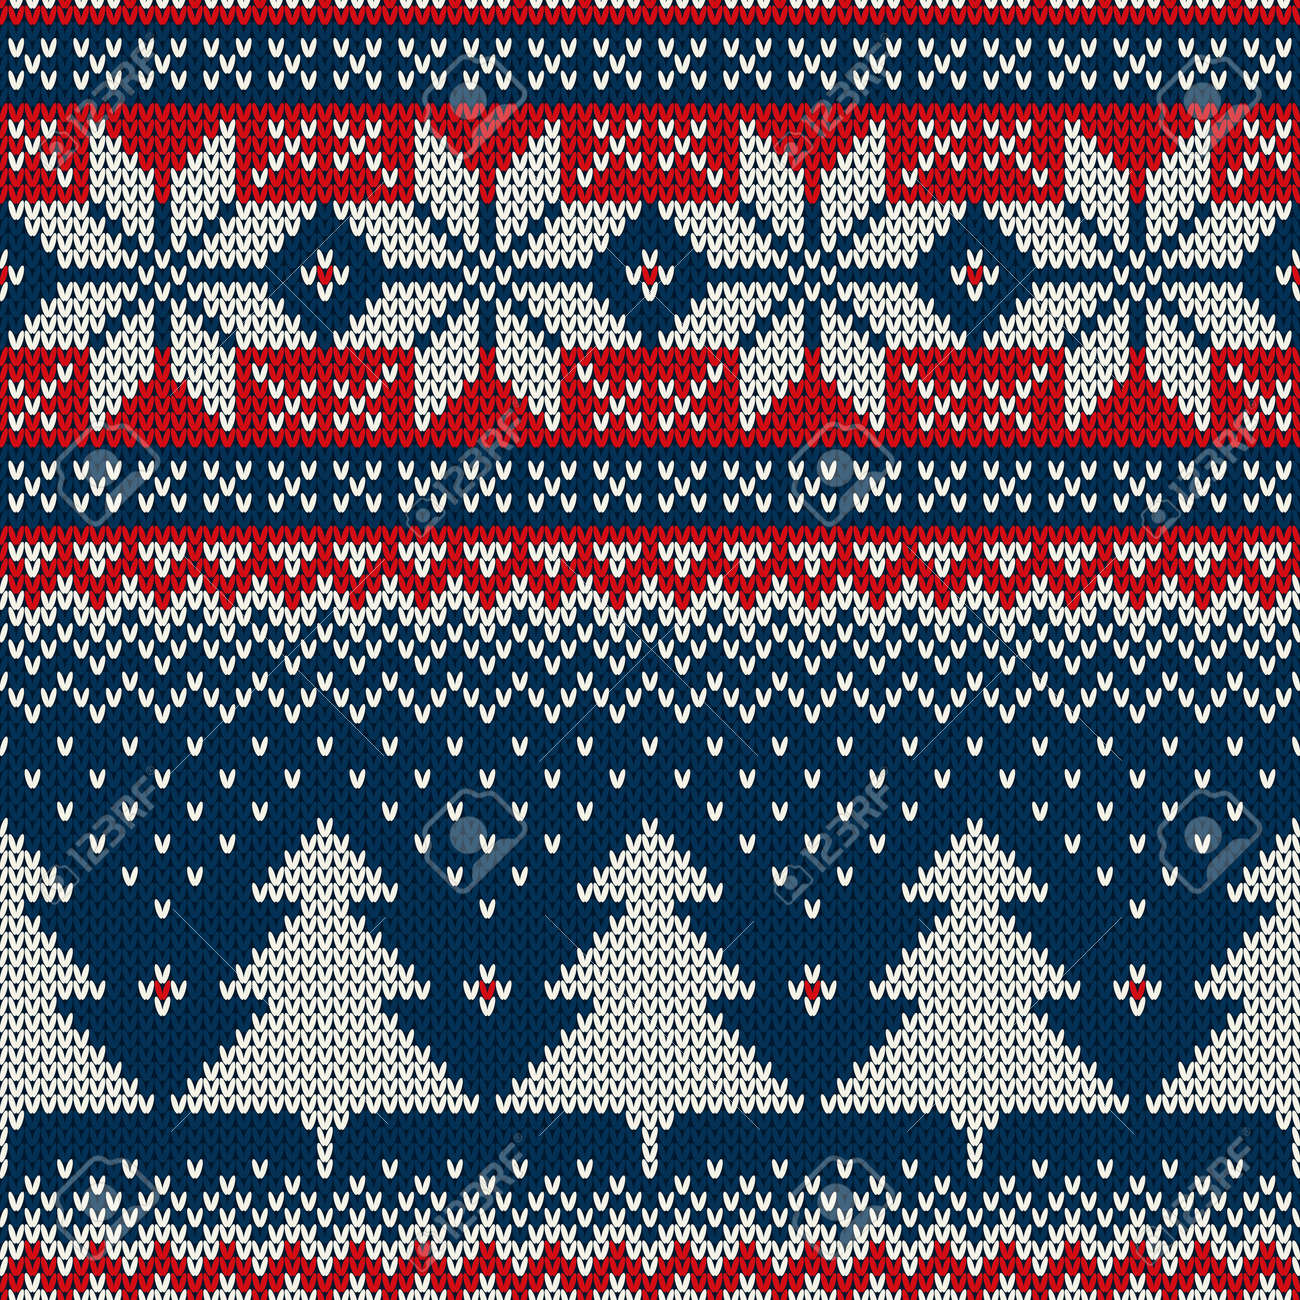 3eba4888db61 Christmas Sweater Design. Seamless Knitted Pattern Royalty Free ...